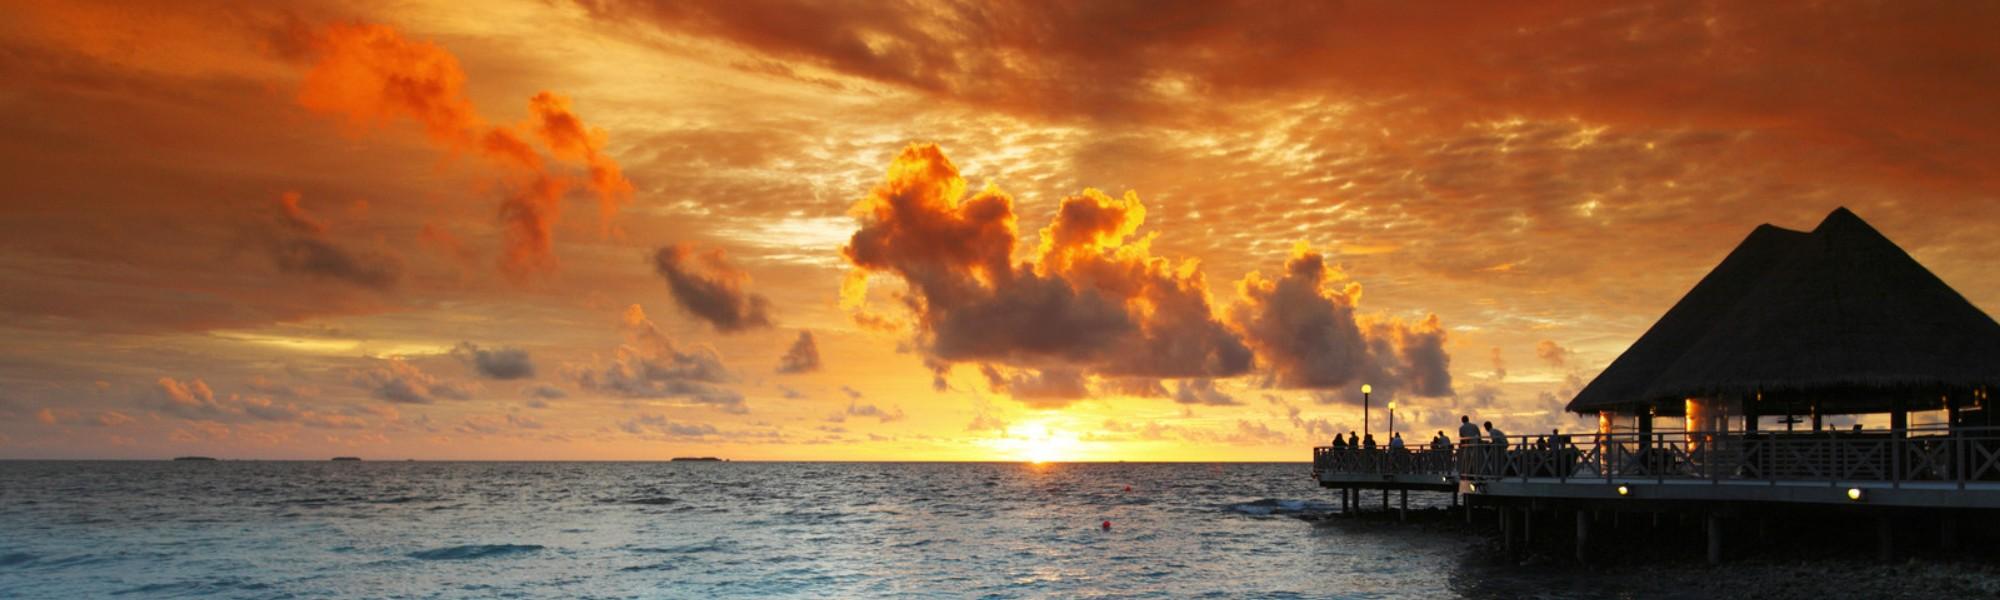 3 island resort_canstockphoto11960605